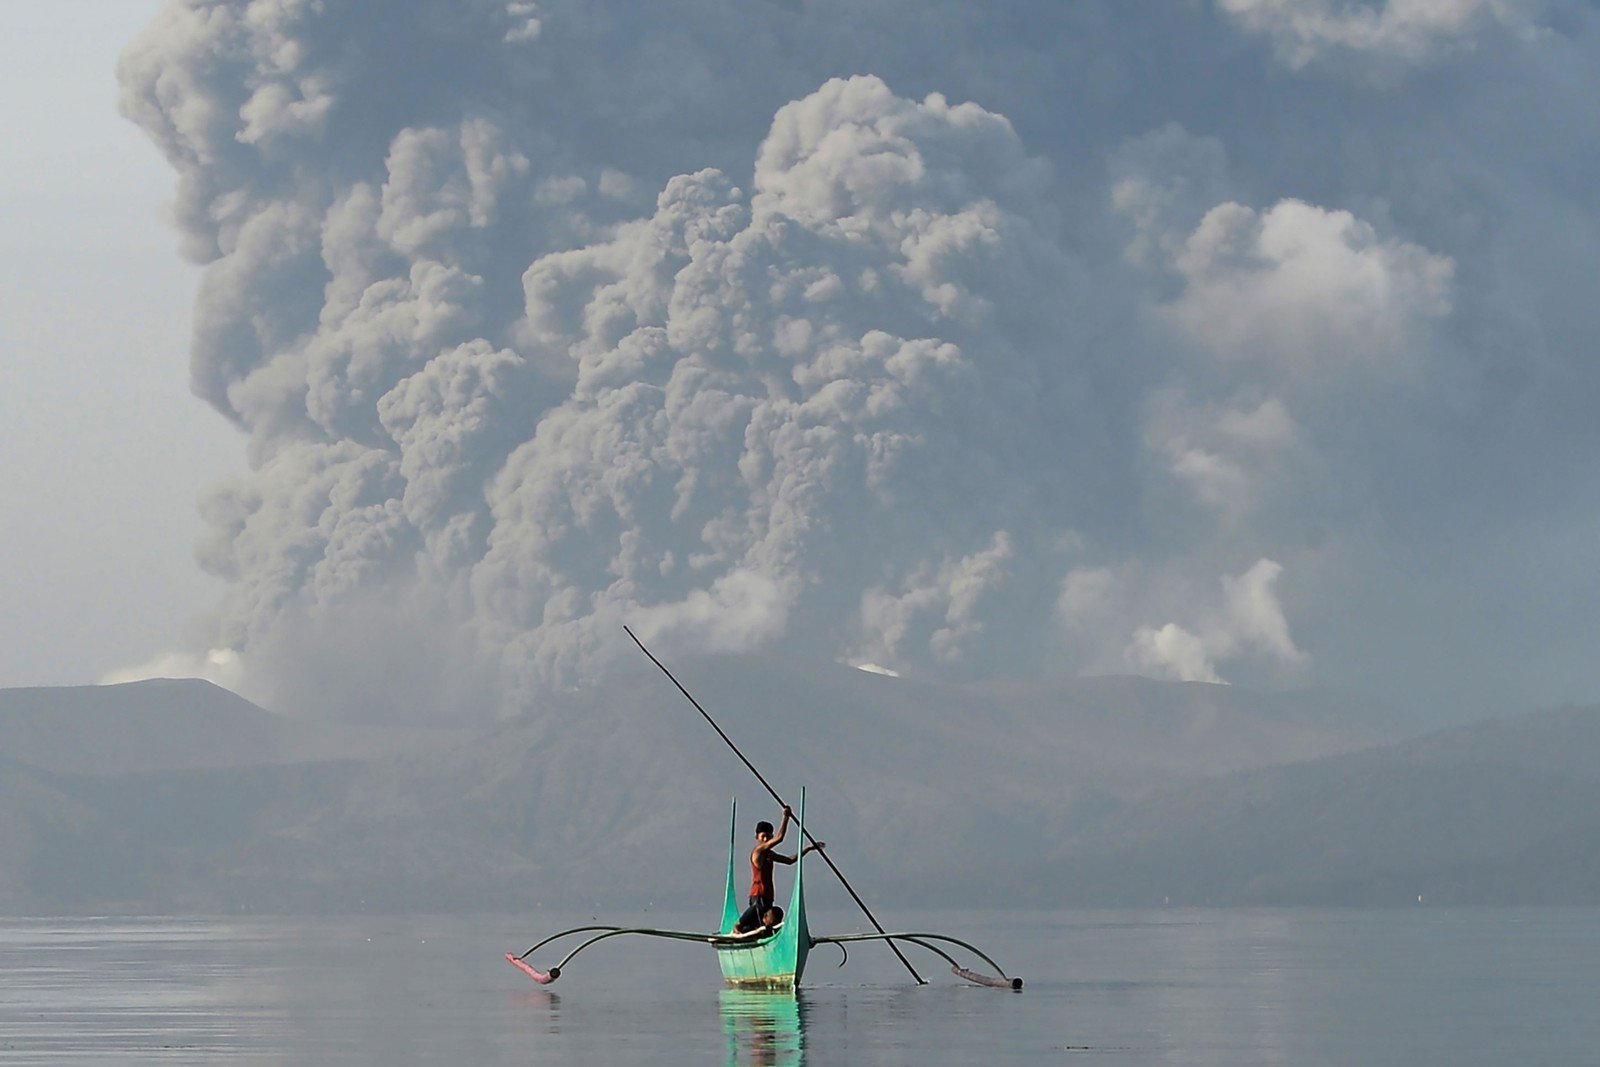 Foto: Ted Aljibe / AFP